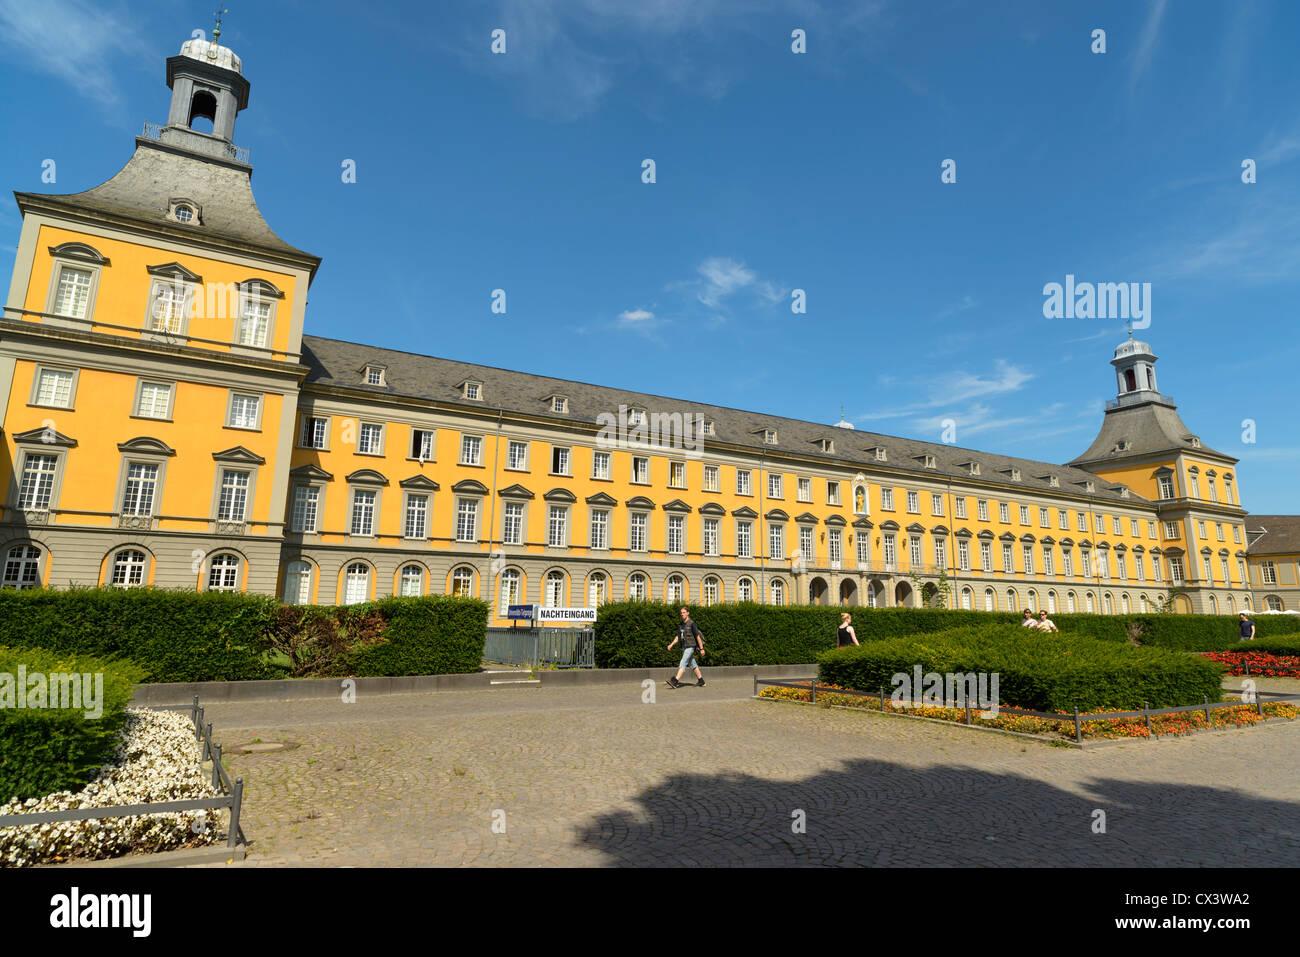 Kurfurstliches Schloss, Bonn, Germany - Stock Image